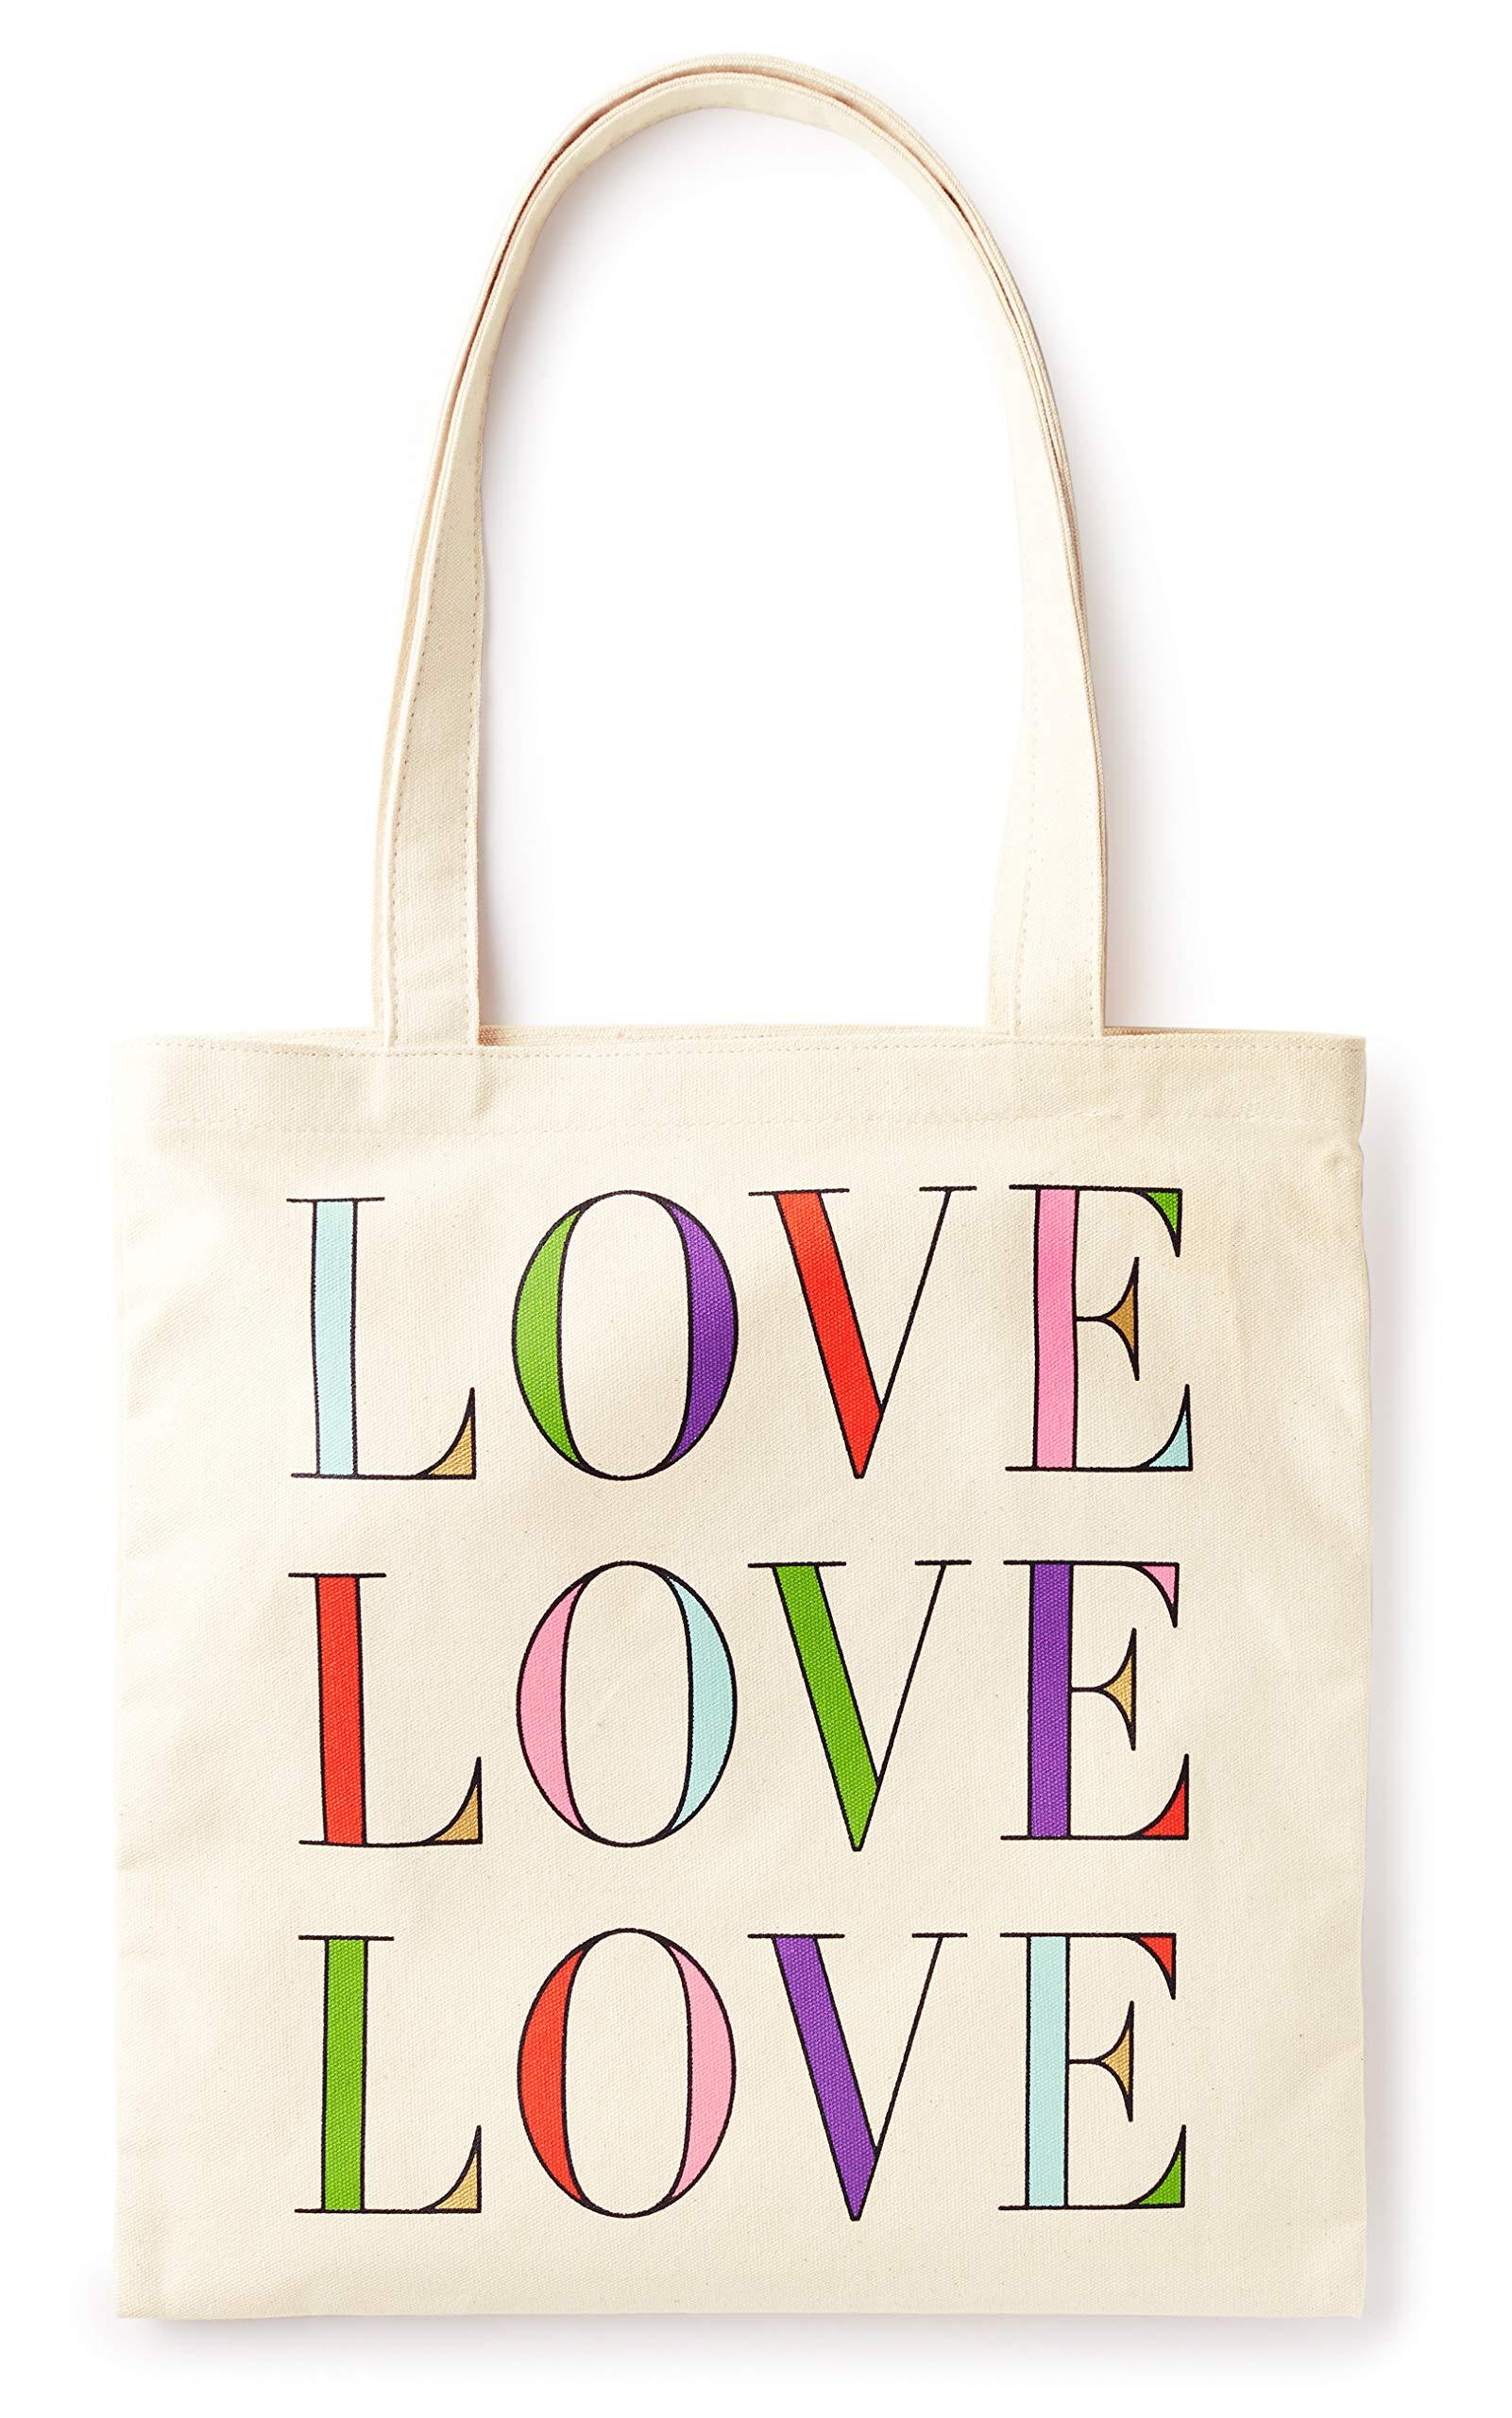 Kate Spade New York Canvas Book Tote (Love Love Love) by Kate Spade New York